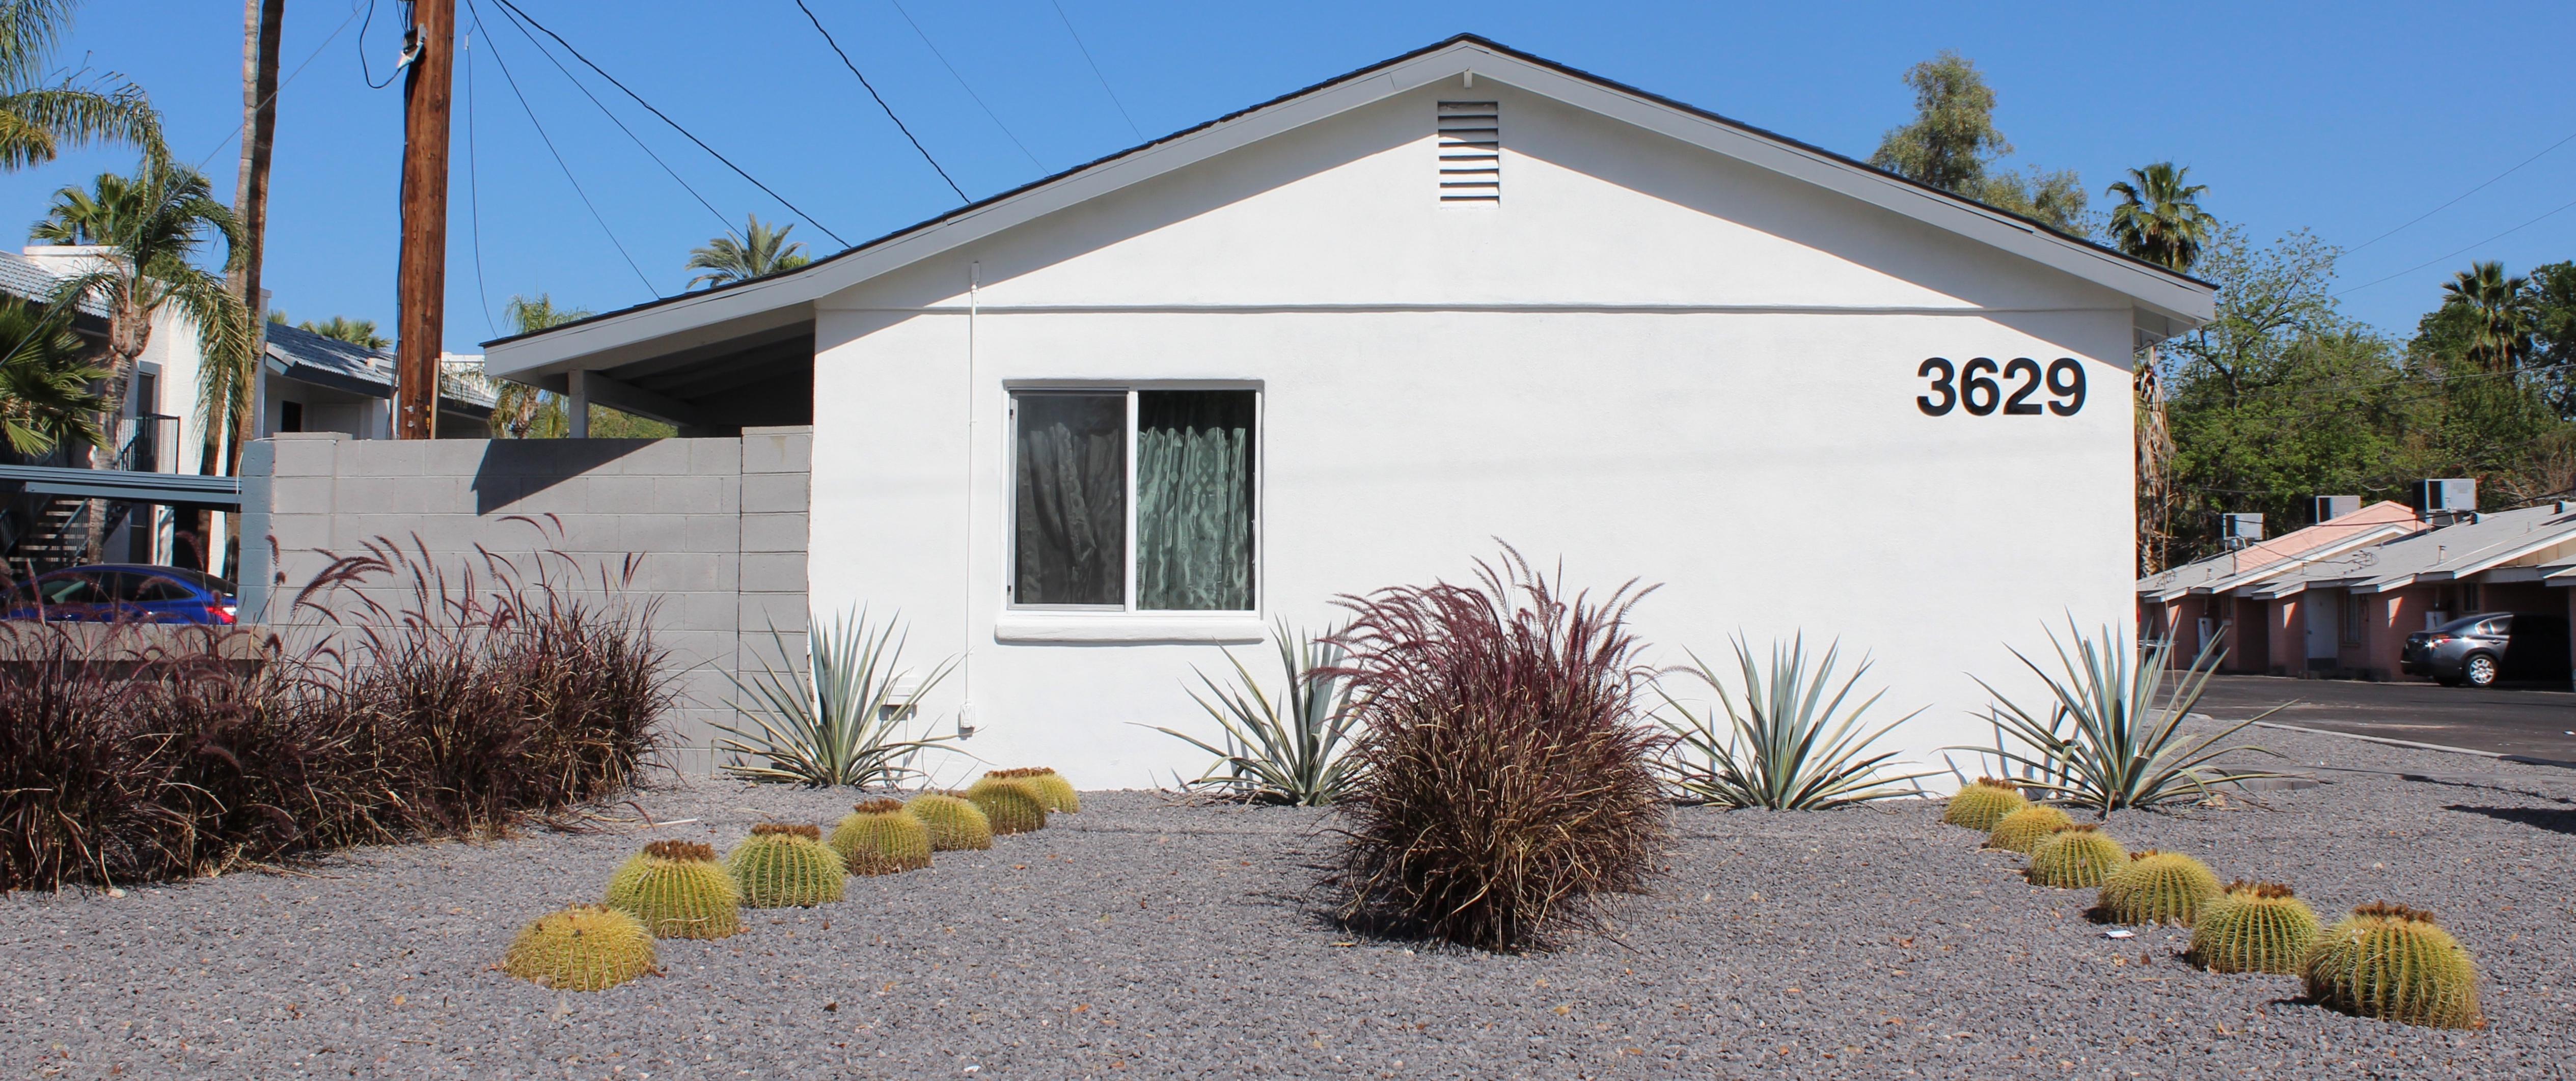 Arcadia Flats @ 37th Street | 3629 N 37th St, Phoenix, AZ 85018